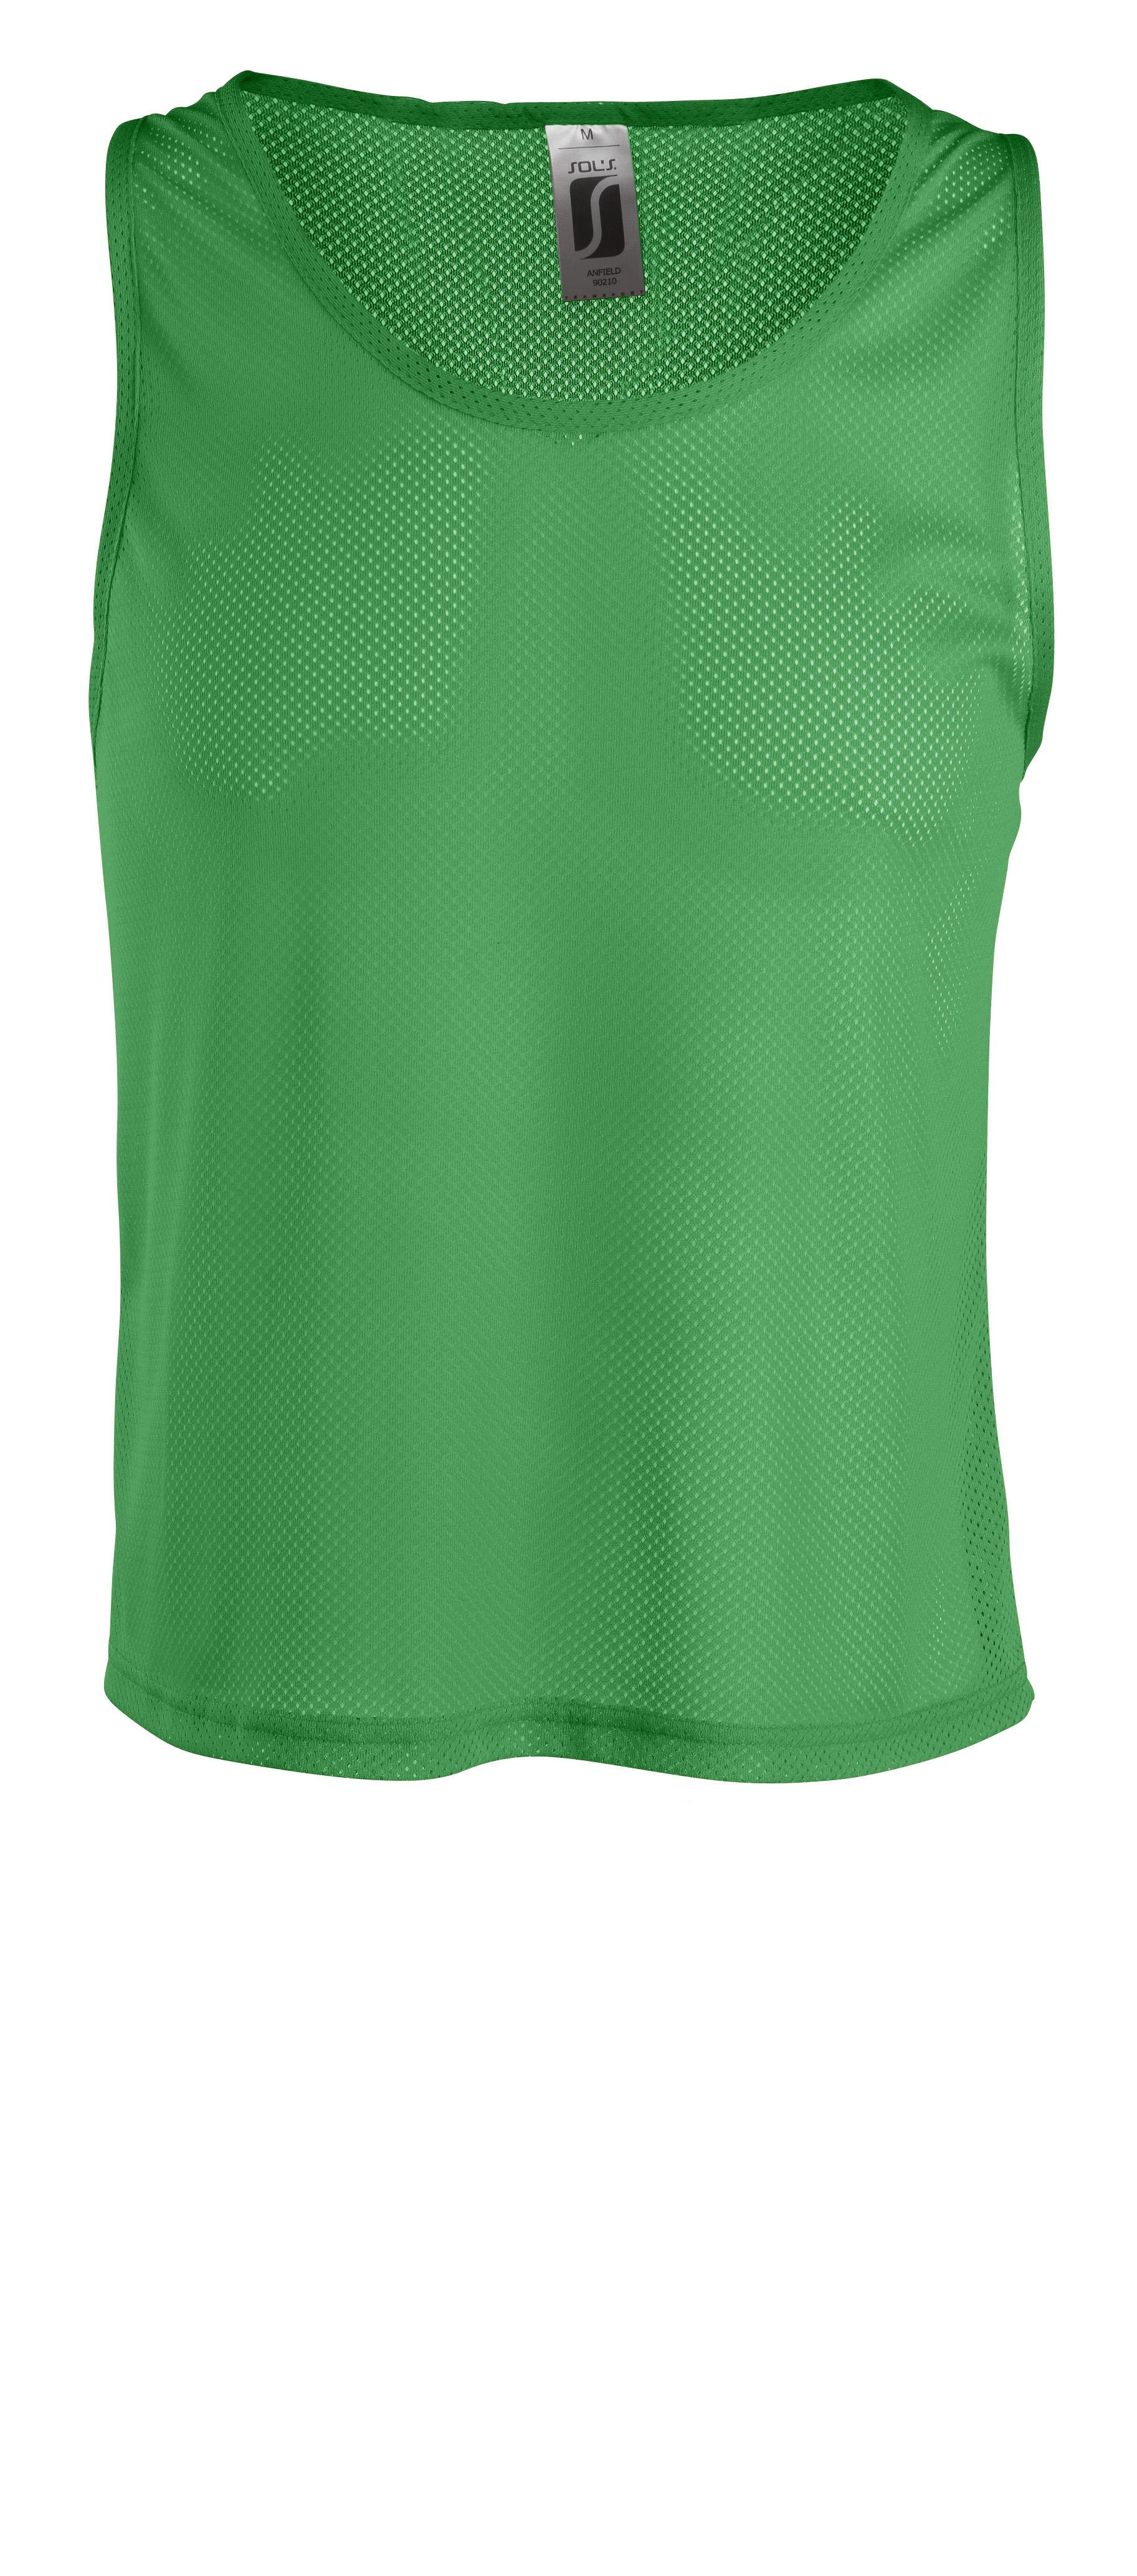 Anfield - Bright Green - XL